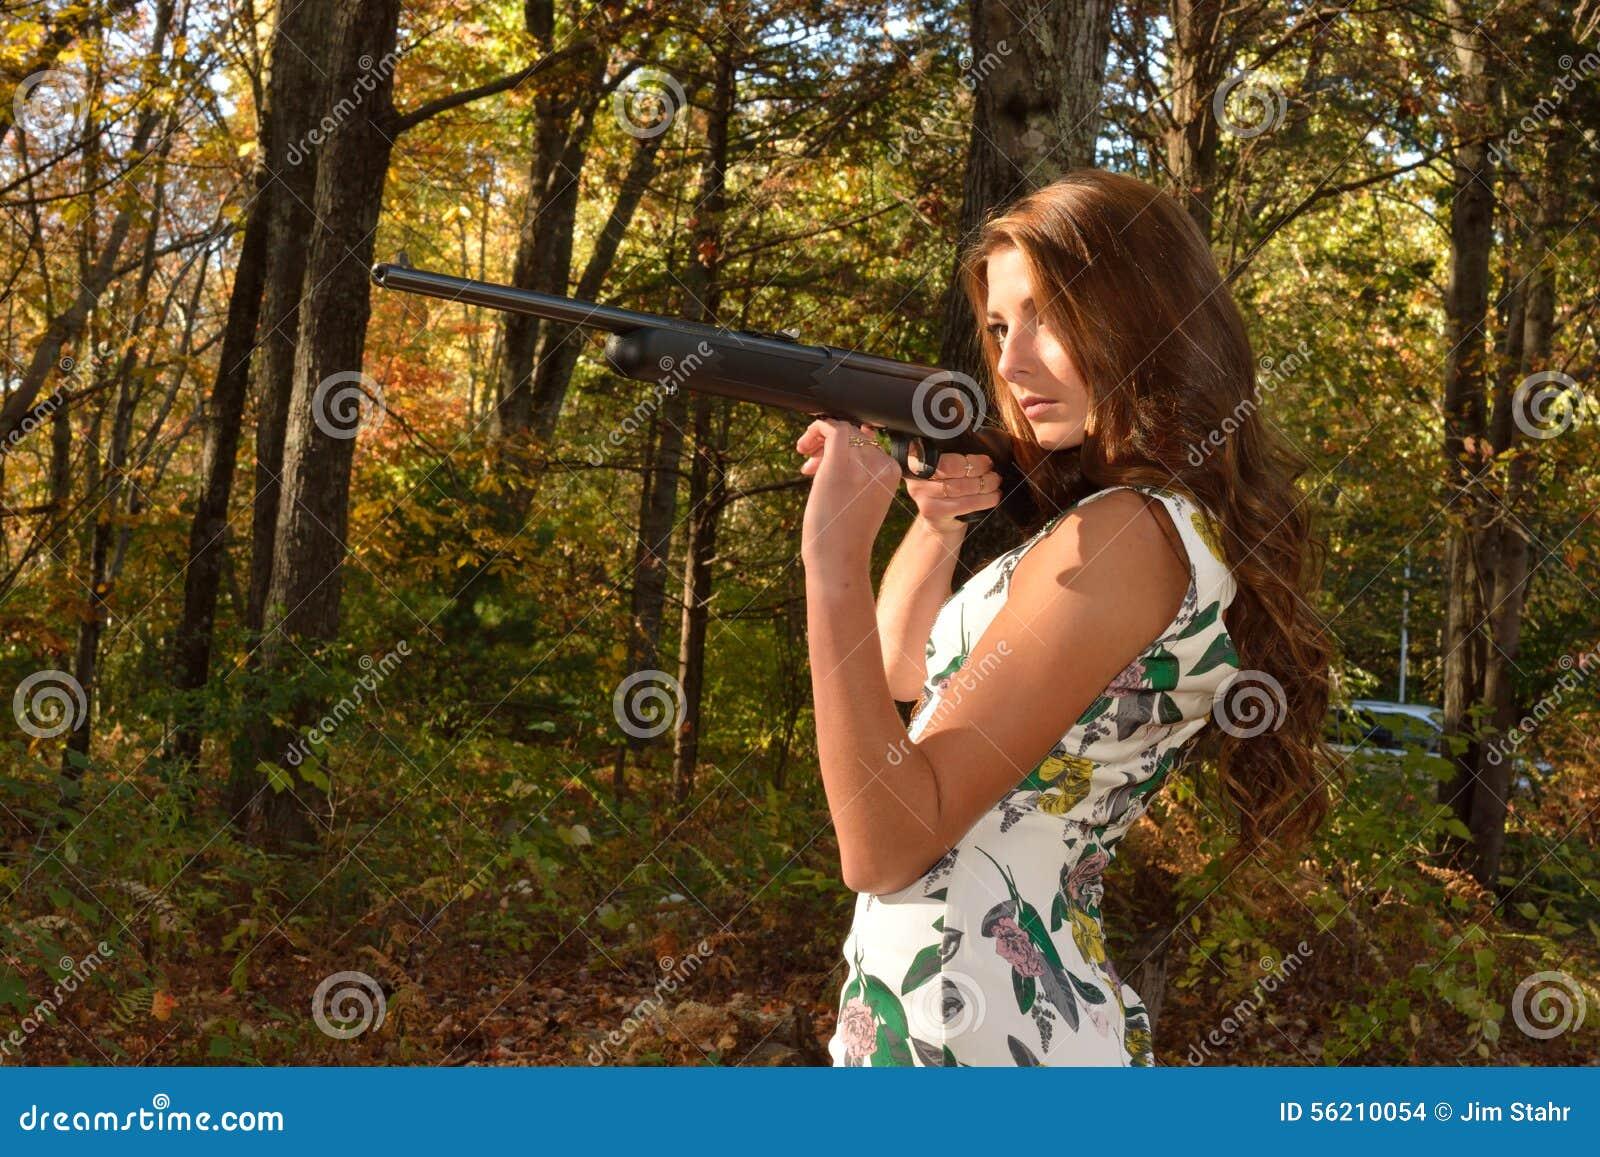 2e95c1baf3a5e Autumn target shoot. stock photo. Image of shooting, lady - 56210054